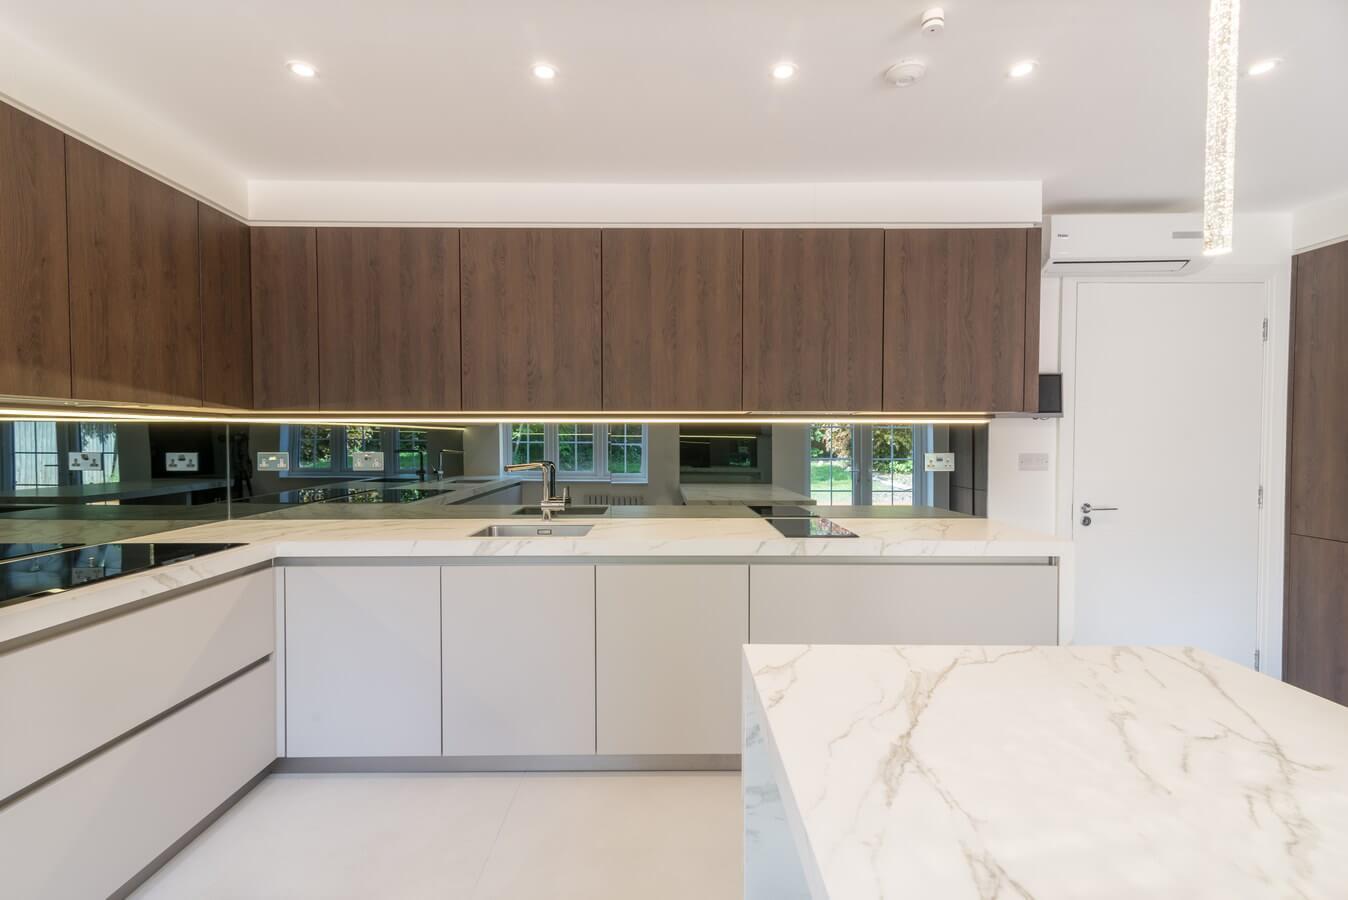 Hendon new kosher kitchen design jpg